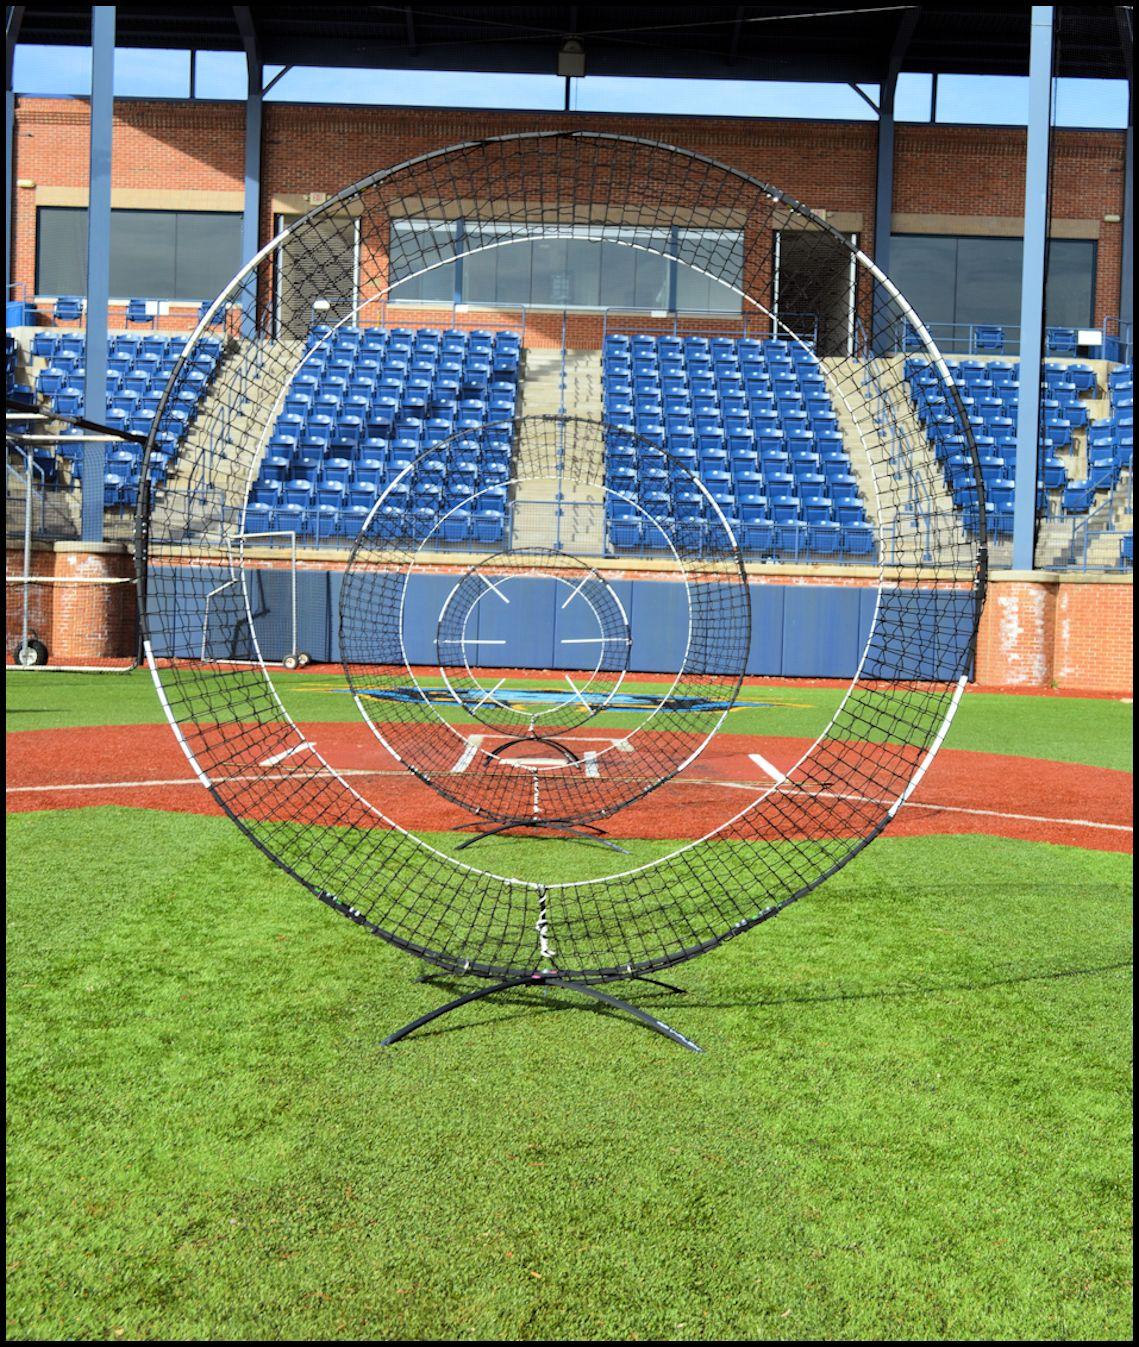 px-series-pitchers-mound-view-2.jpg